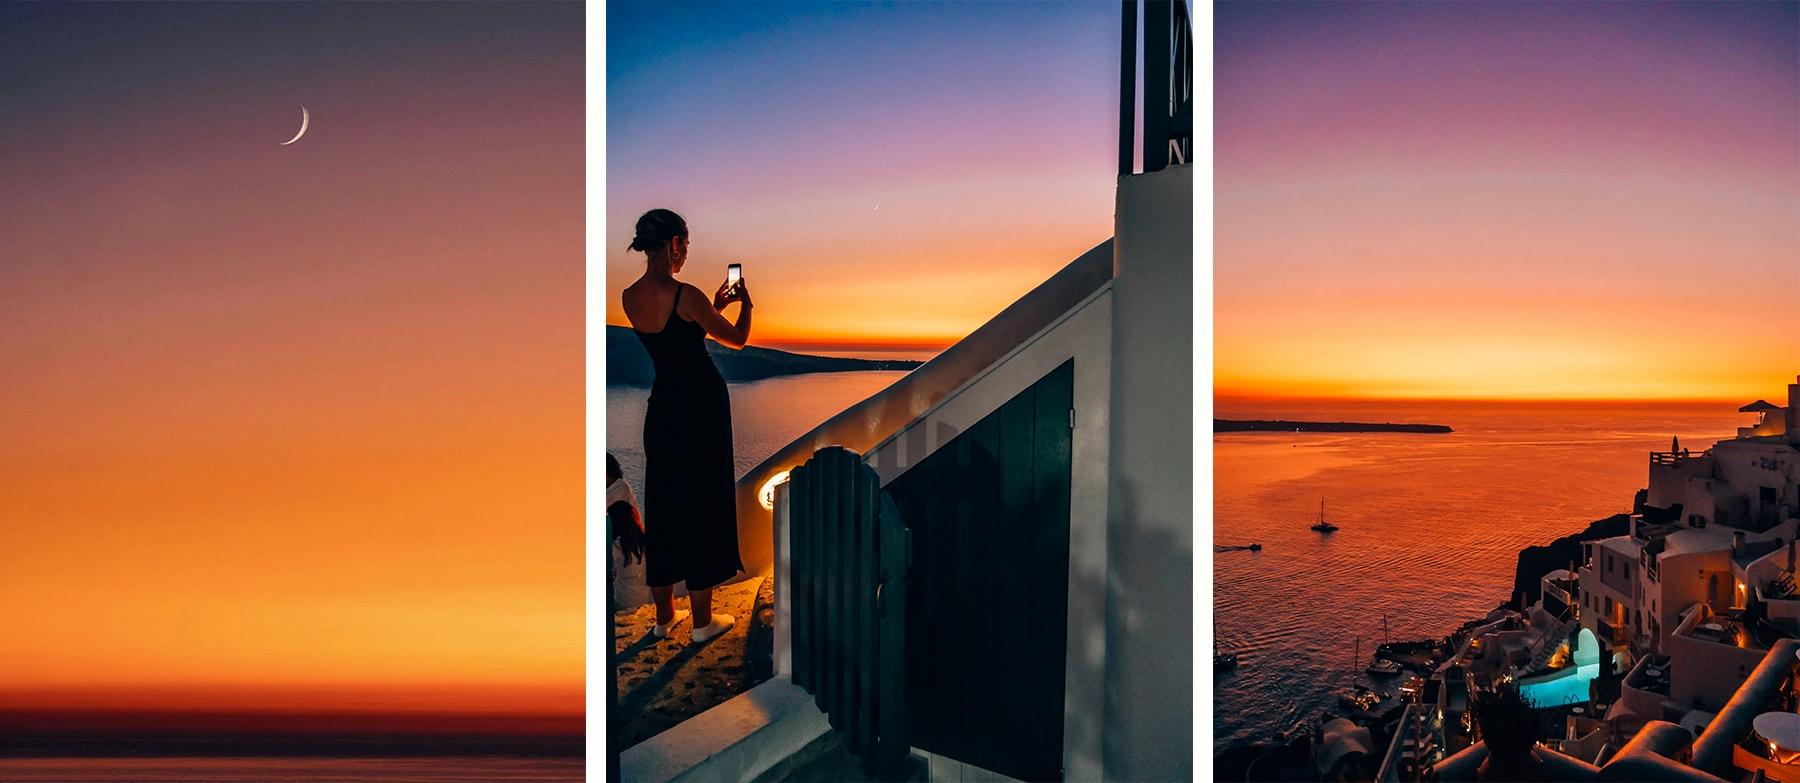 hotel santorin sunset